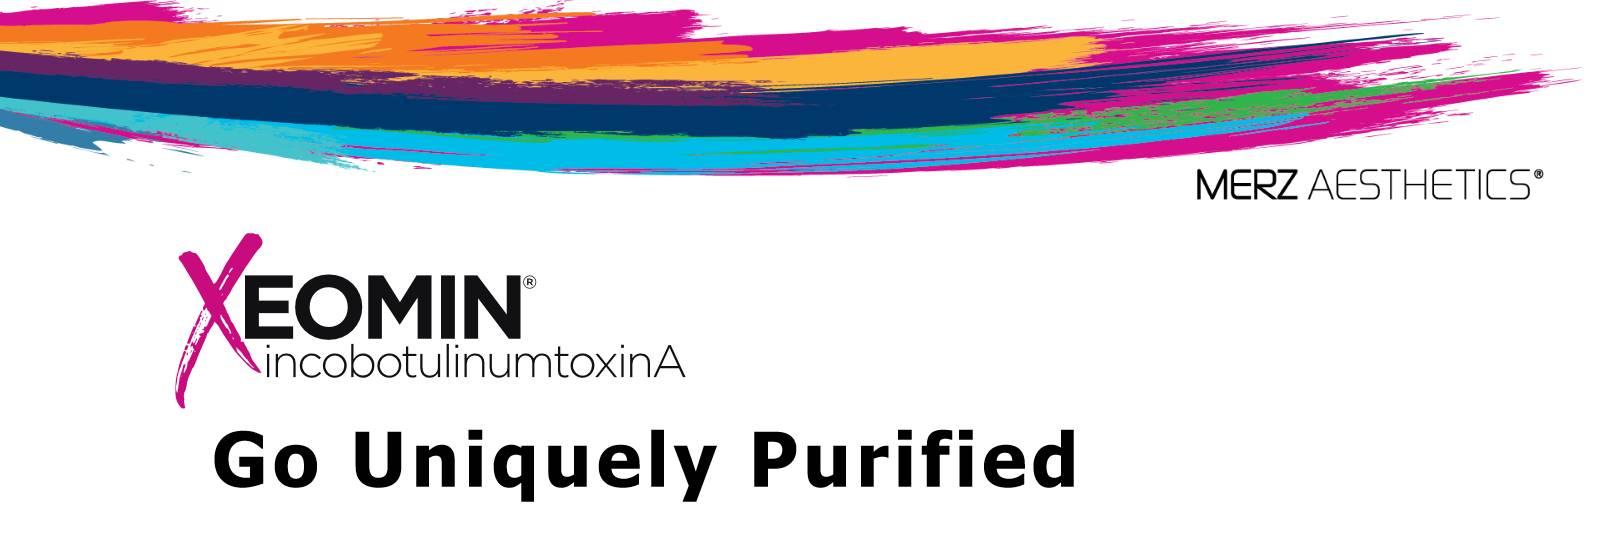 Xeomin (incobotulinumtoxinA) Go Uniquely Purified